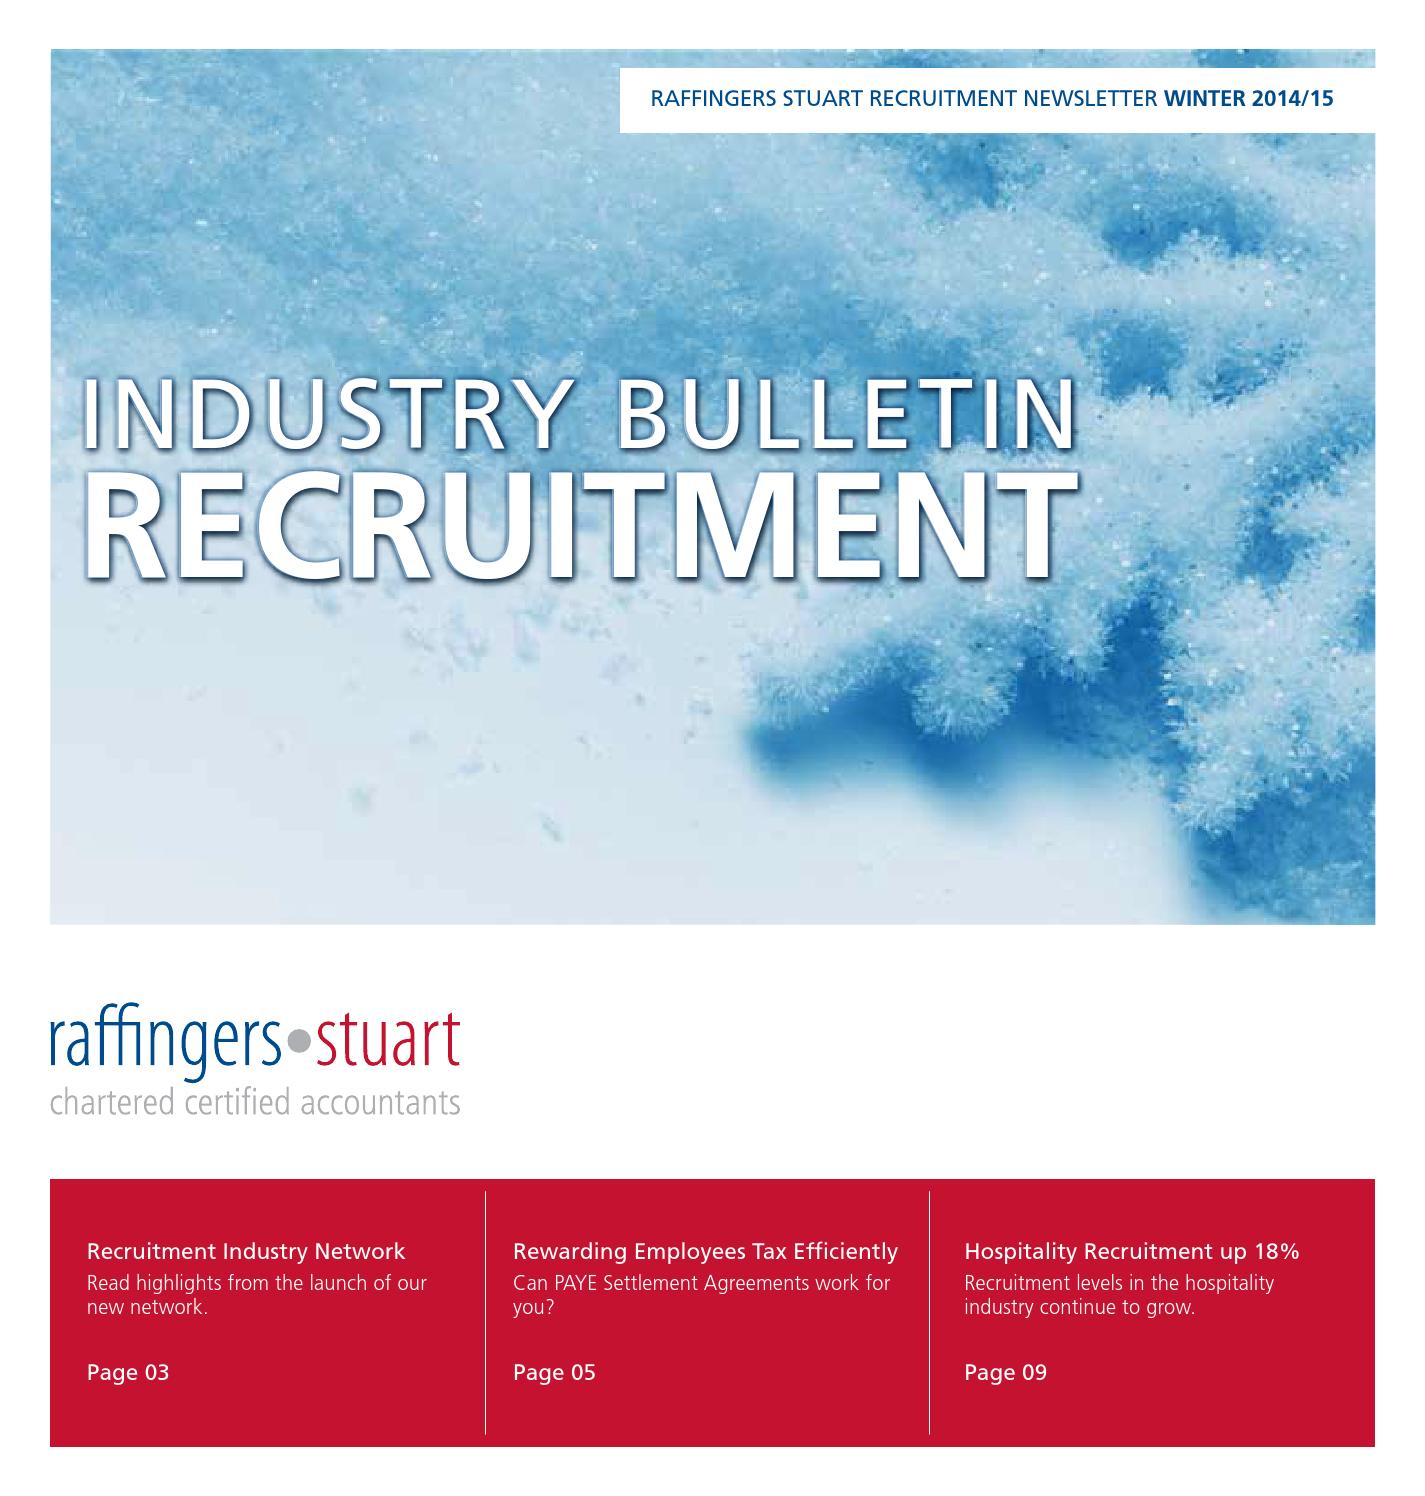 Recruitment Winter Newsletter 2014/15